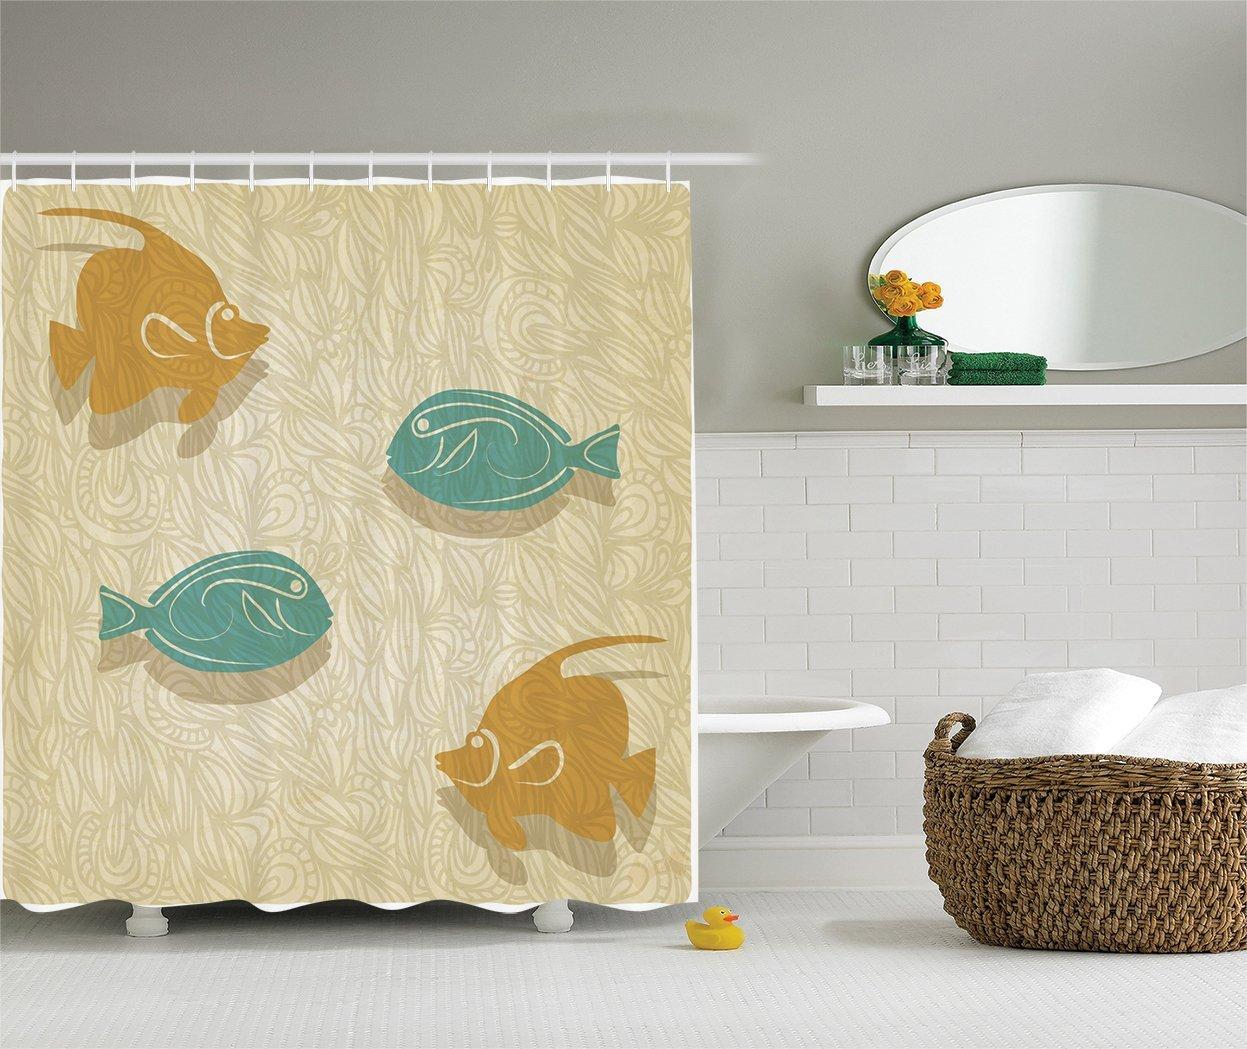 Fish And Waves Shower Curtain Set Aquarium Marine Ocean Themed Fishing Decor Bathroom Accessories